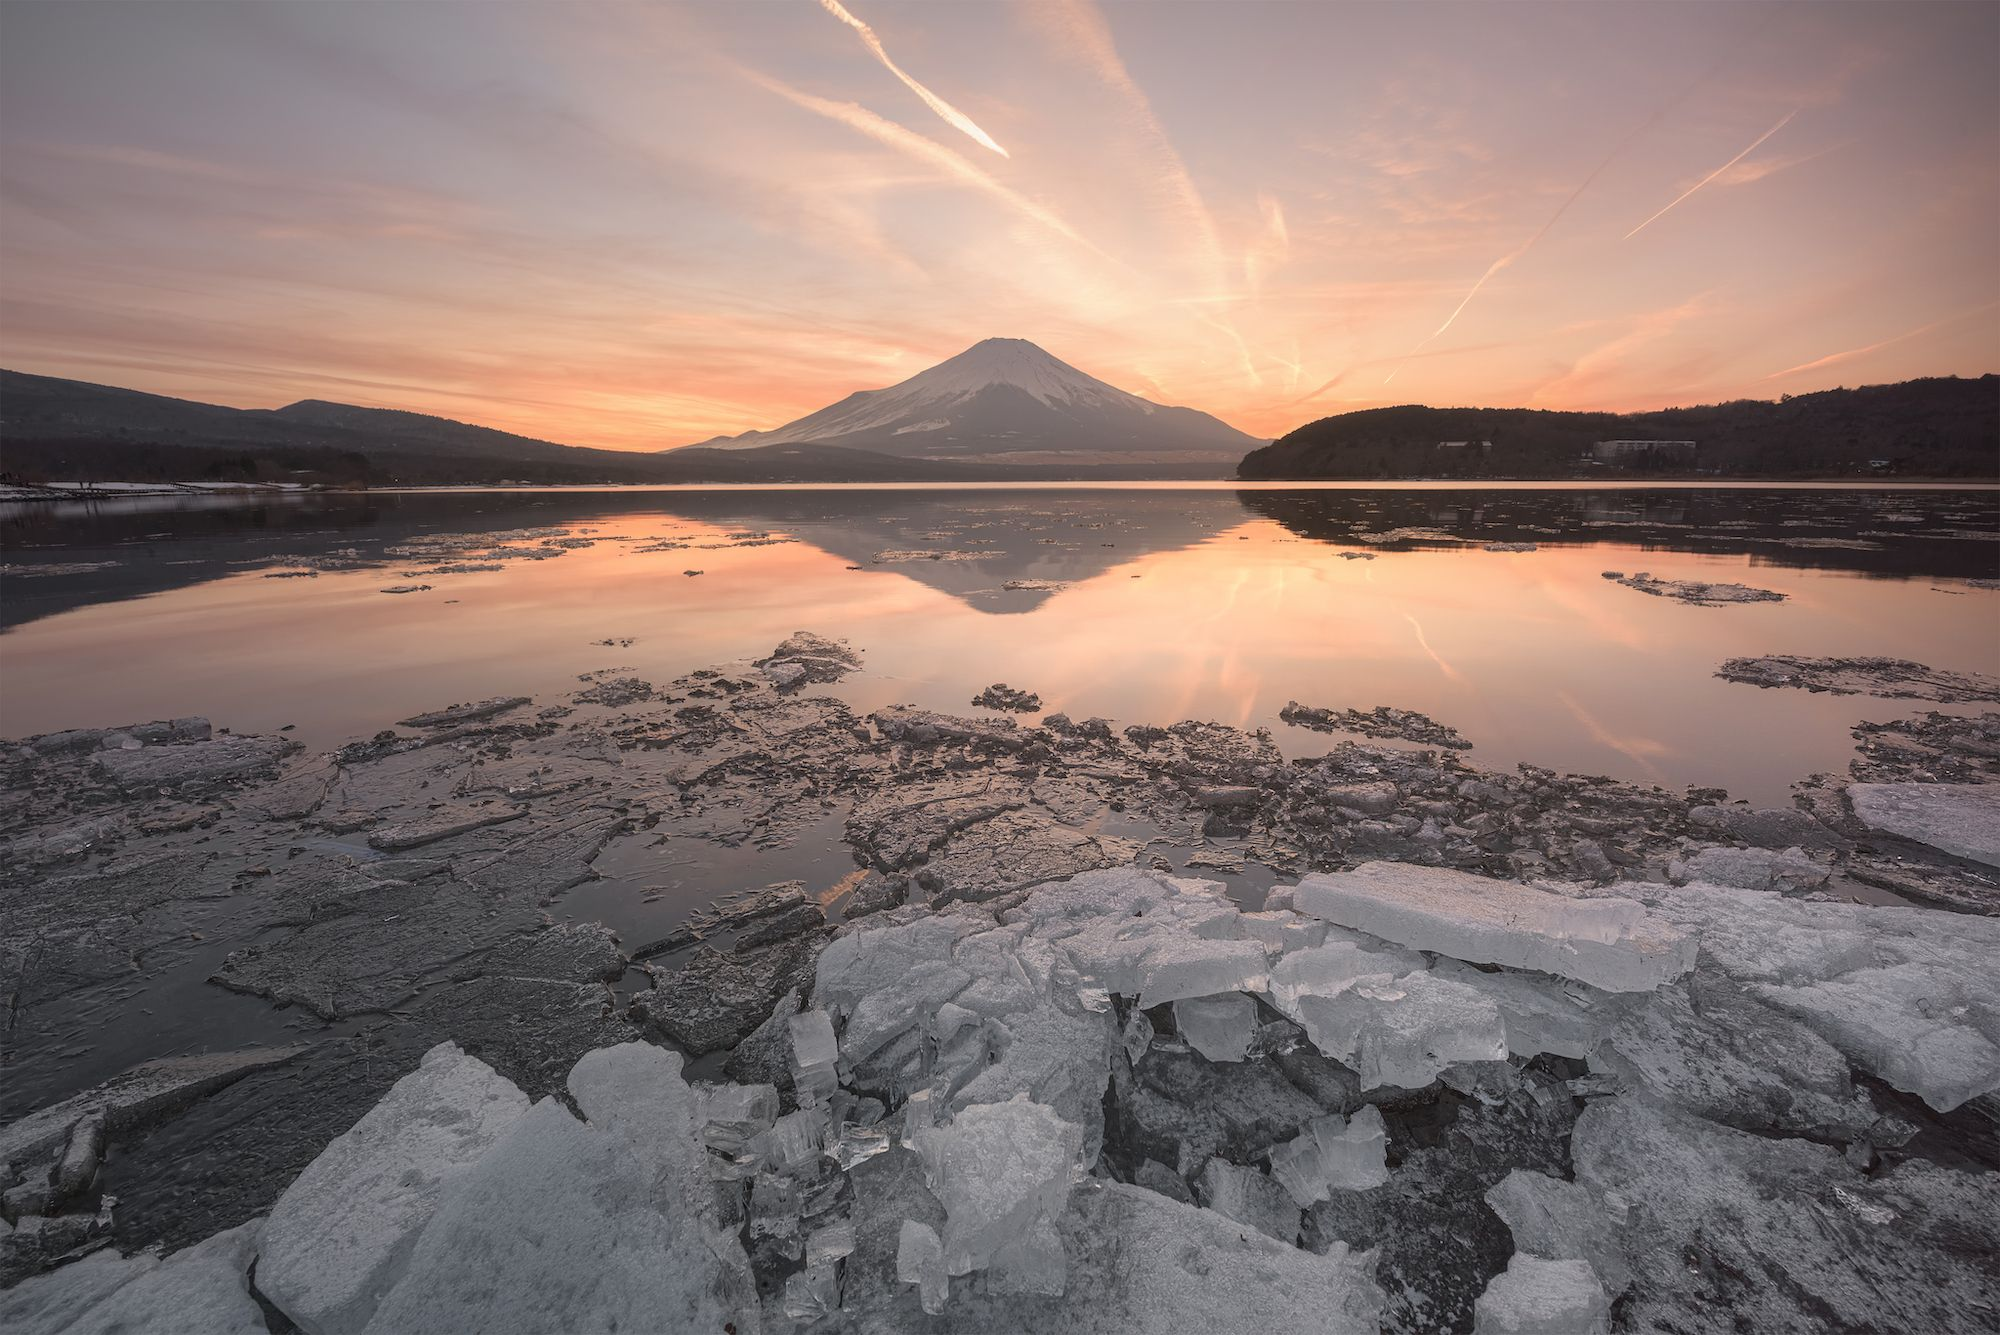 Photo by : Ryuhei Hosomi . Follow us for amazing posts! #PASHADELIC #FUJIdelic . . #light_nikon #nikond810 #mtfuji #fujiyama #fujisan #photography #photooftheday #nature #naturephotography #landscape #landscapephotography #japan #japan_of_insta #japanphoto #igers #ig_japan #mountain #mountains #mountainphotography #富士山 #富士 #山